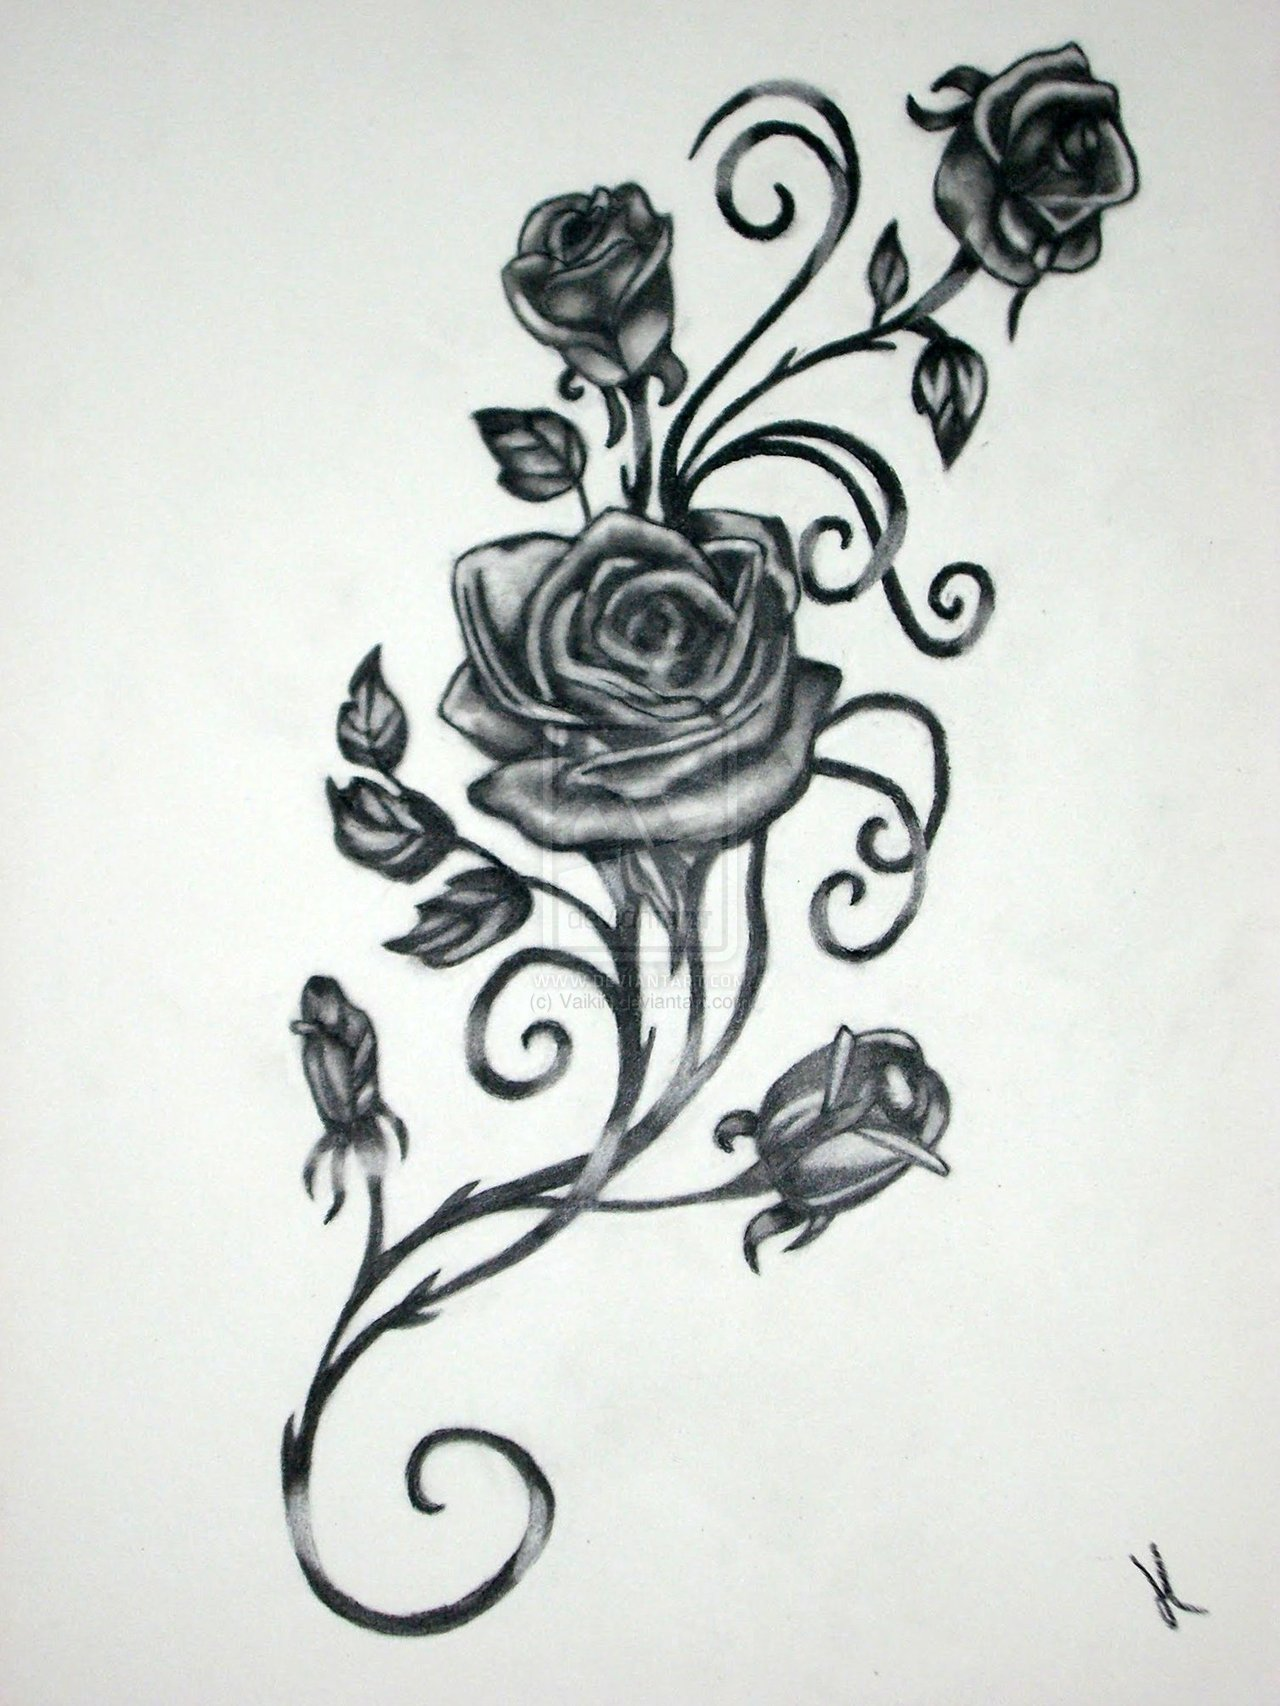 Drawn rose gothic Pattern Designs Vine Rose Vine